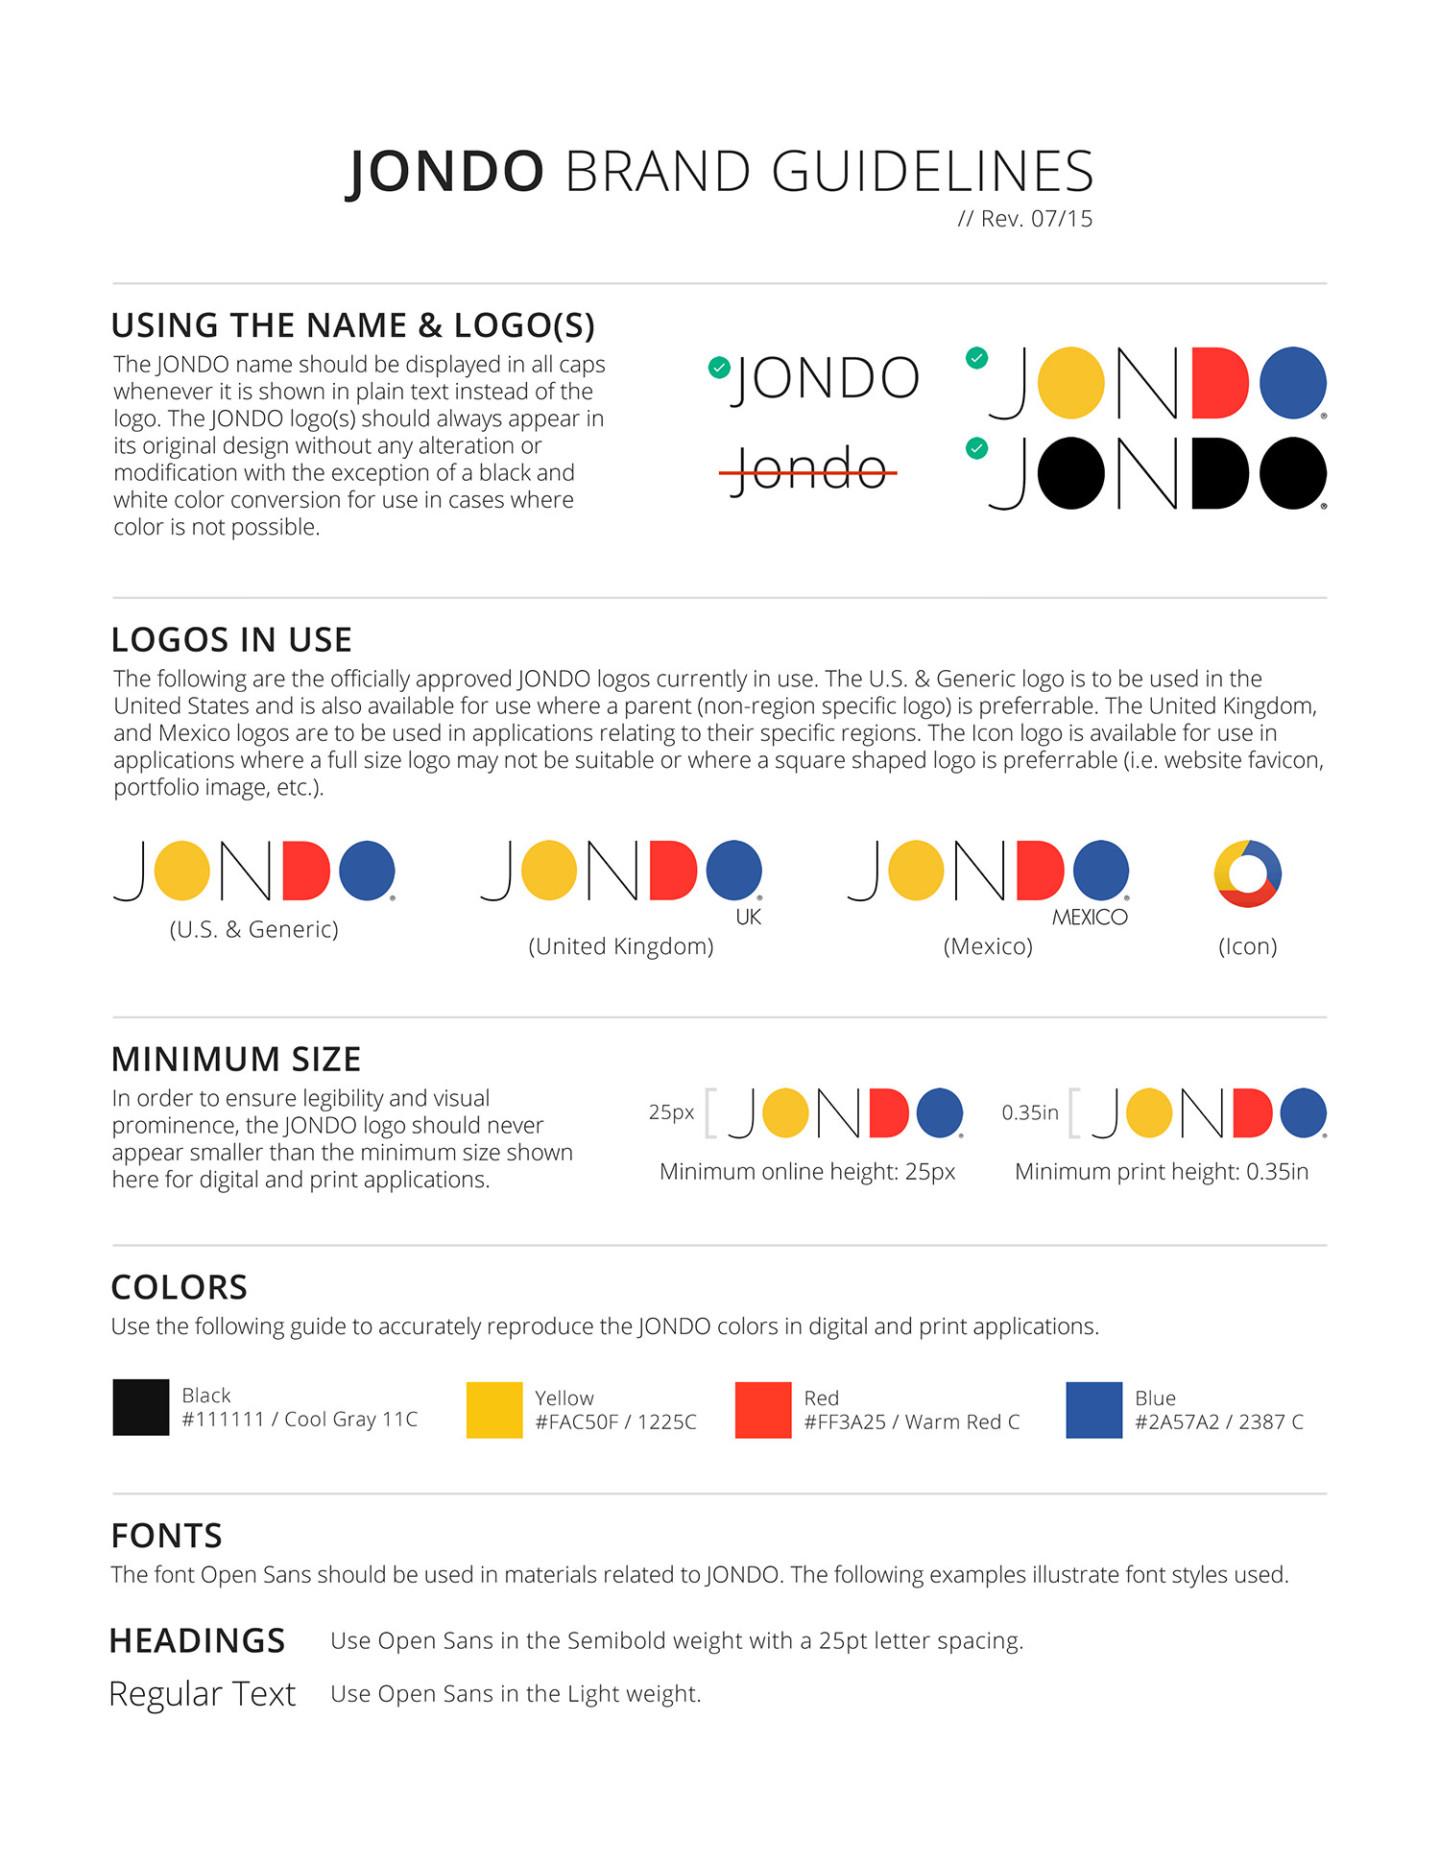 JONDO Brand Guidelines